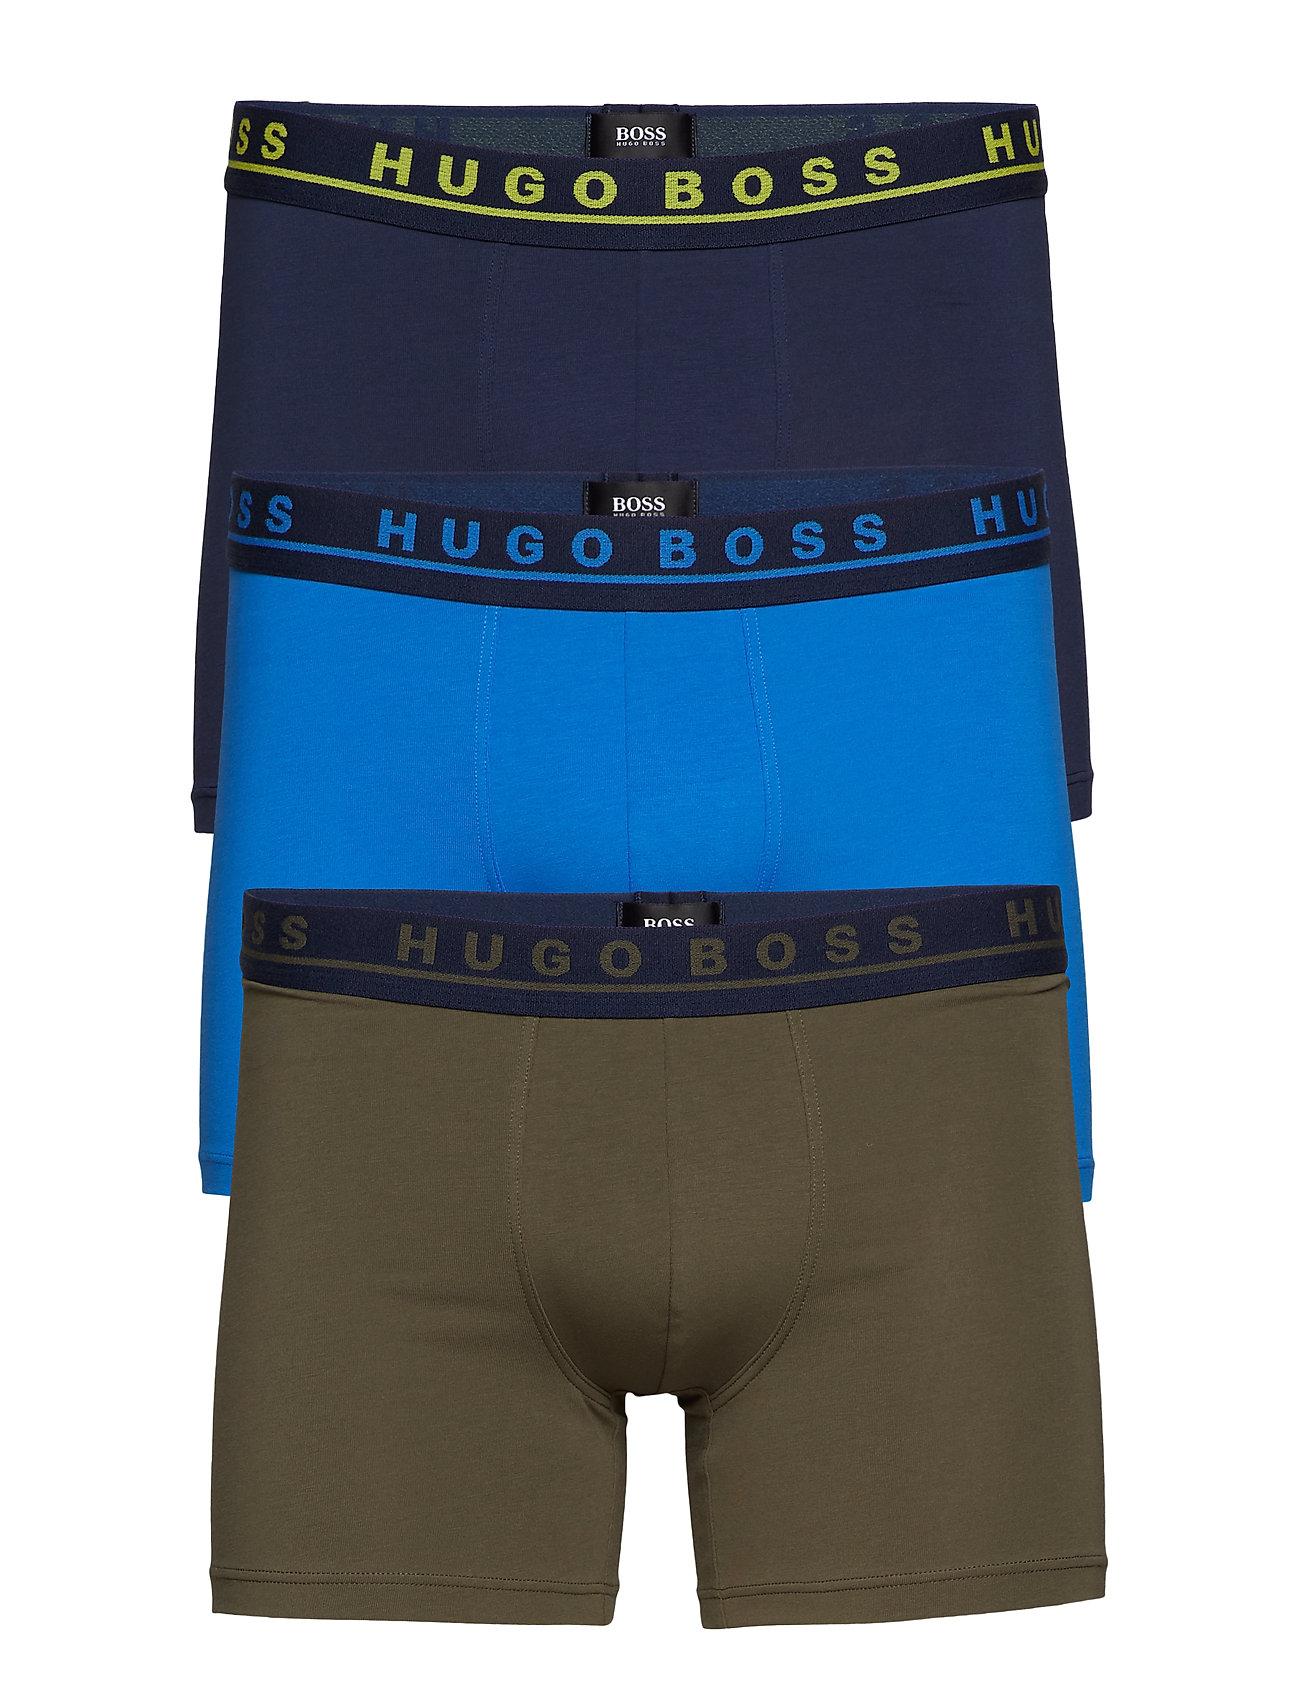 BOSS Business Wear Boxer Brief 3P CO/EL